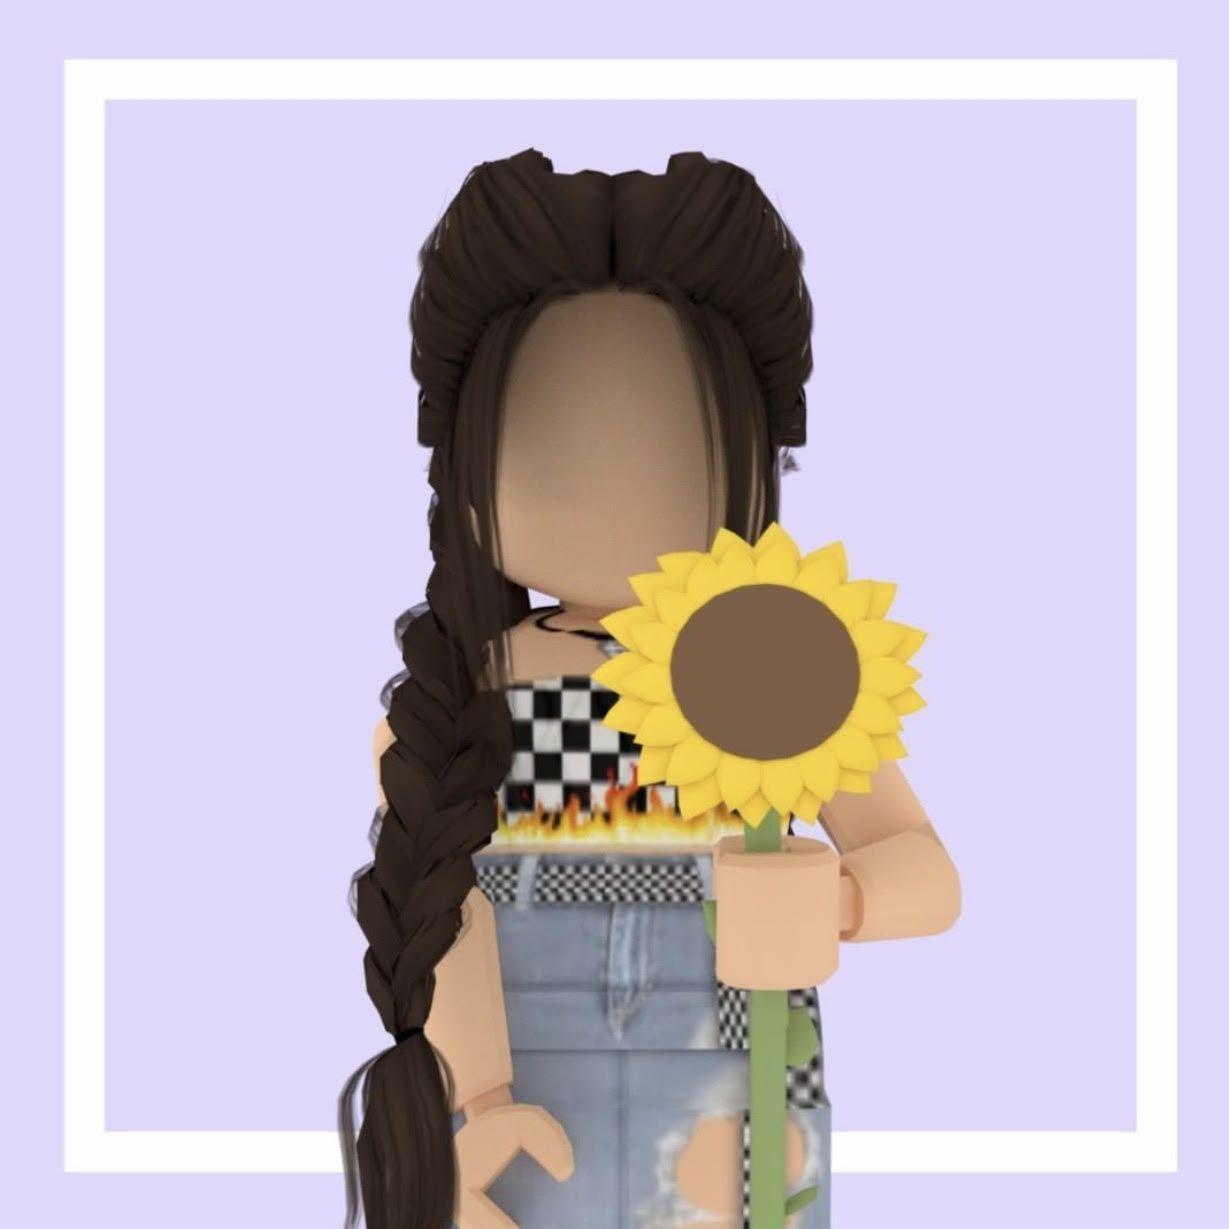 1229x1229 Gfx Roblox Girl Aesthetic Black - Gfx Roblox Girl Aesthetic in 2020. Hoạt hình Roblox, Roblox vui nhộn, ảnh Roblox